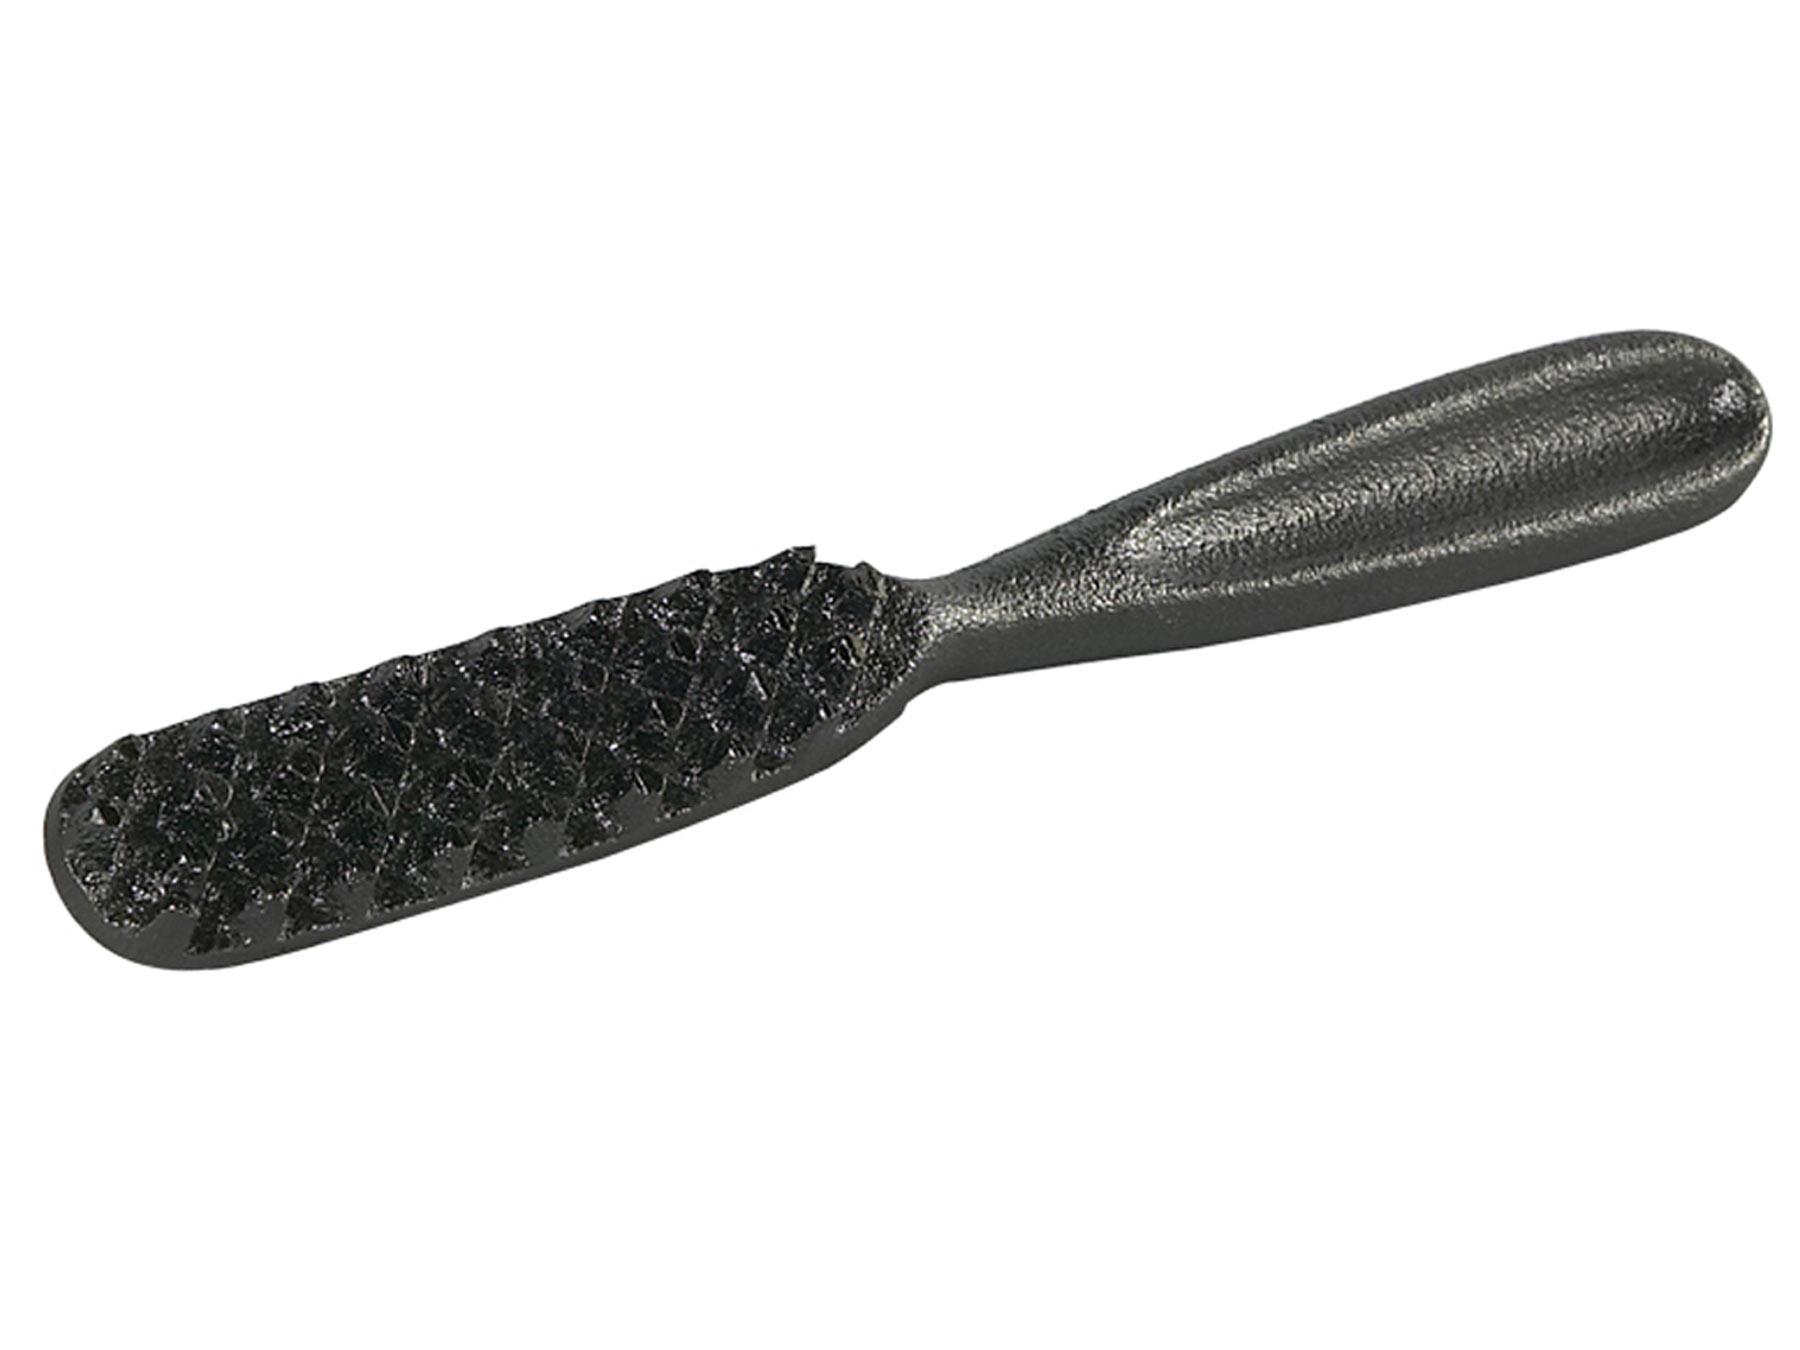 Skeppshult Fischschupenentferner 18 cm